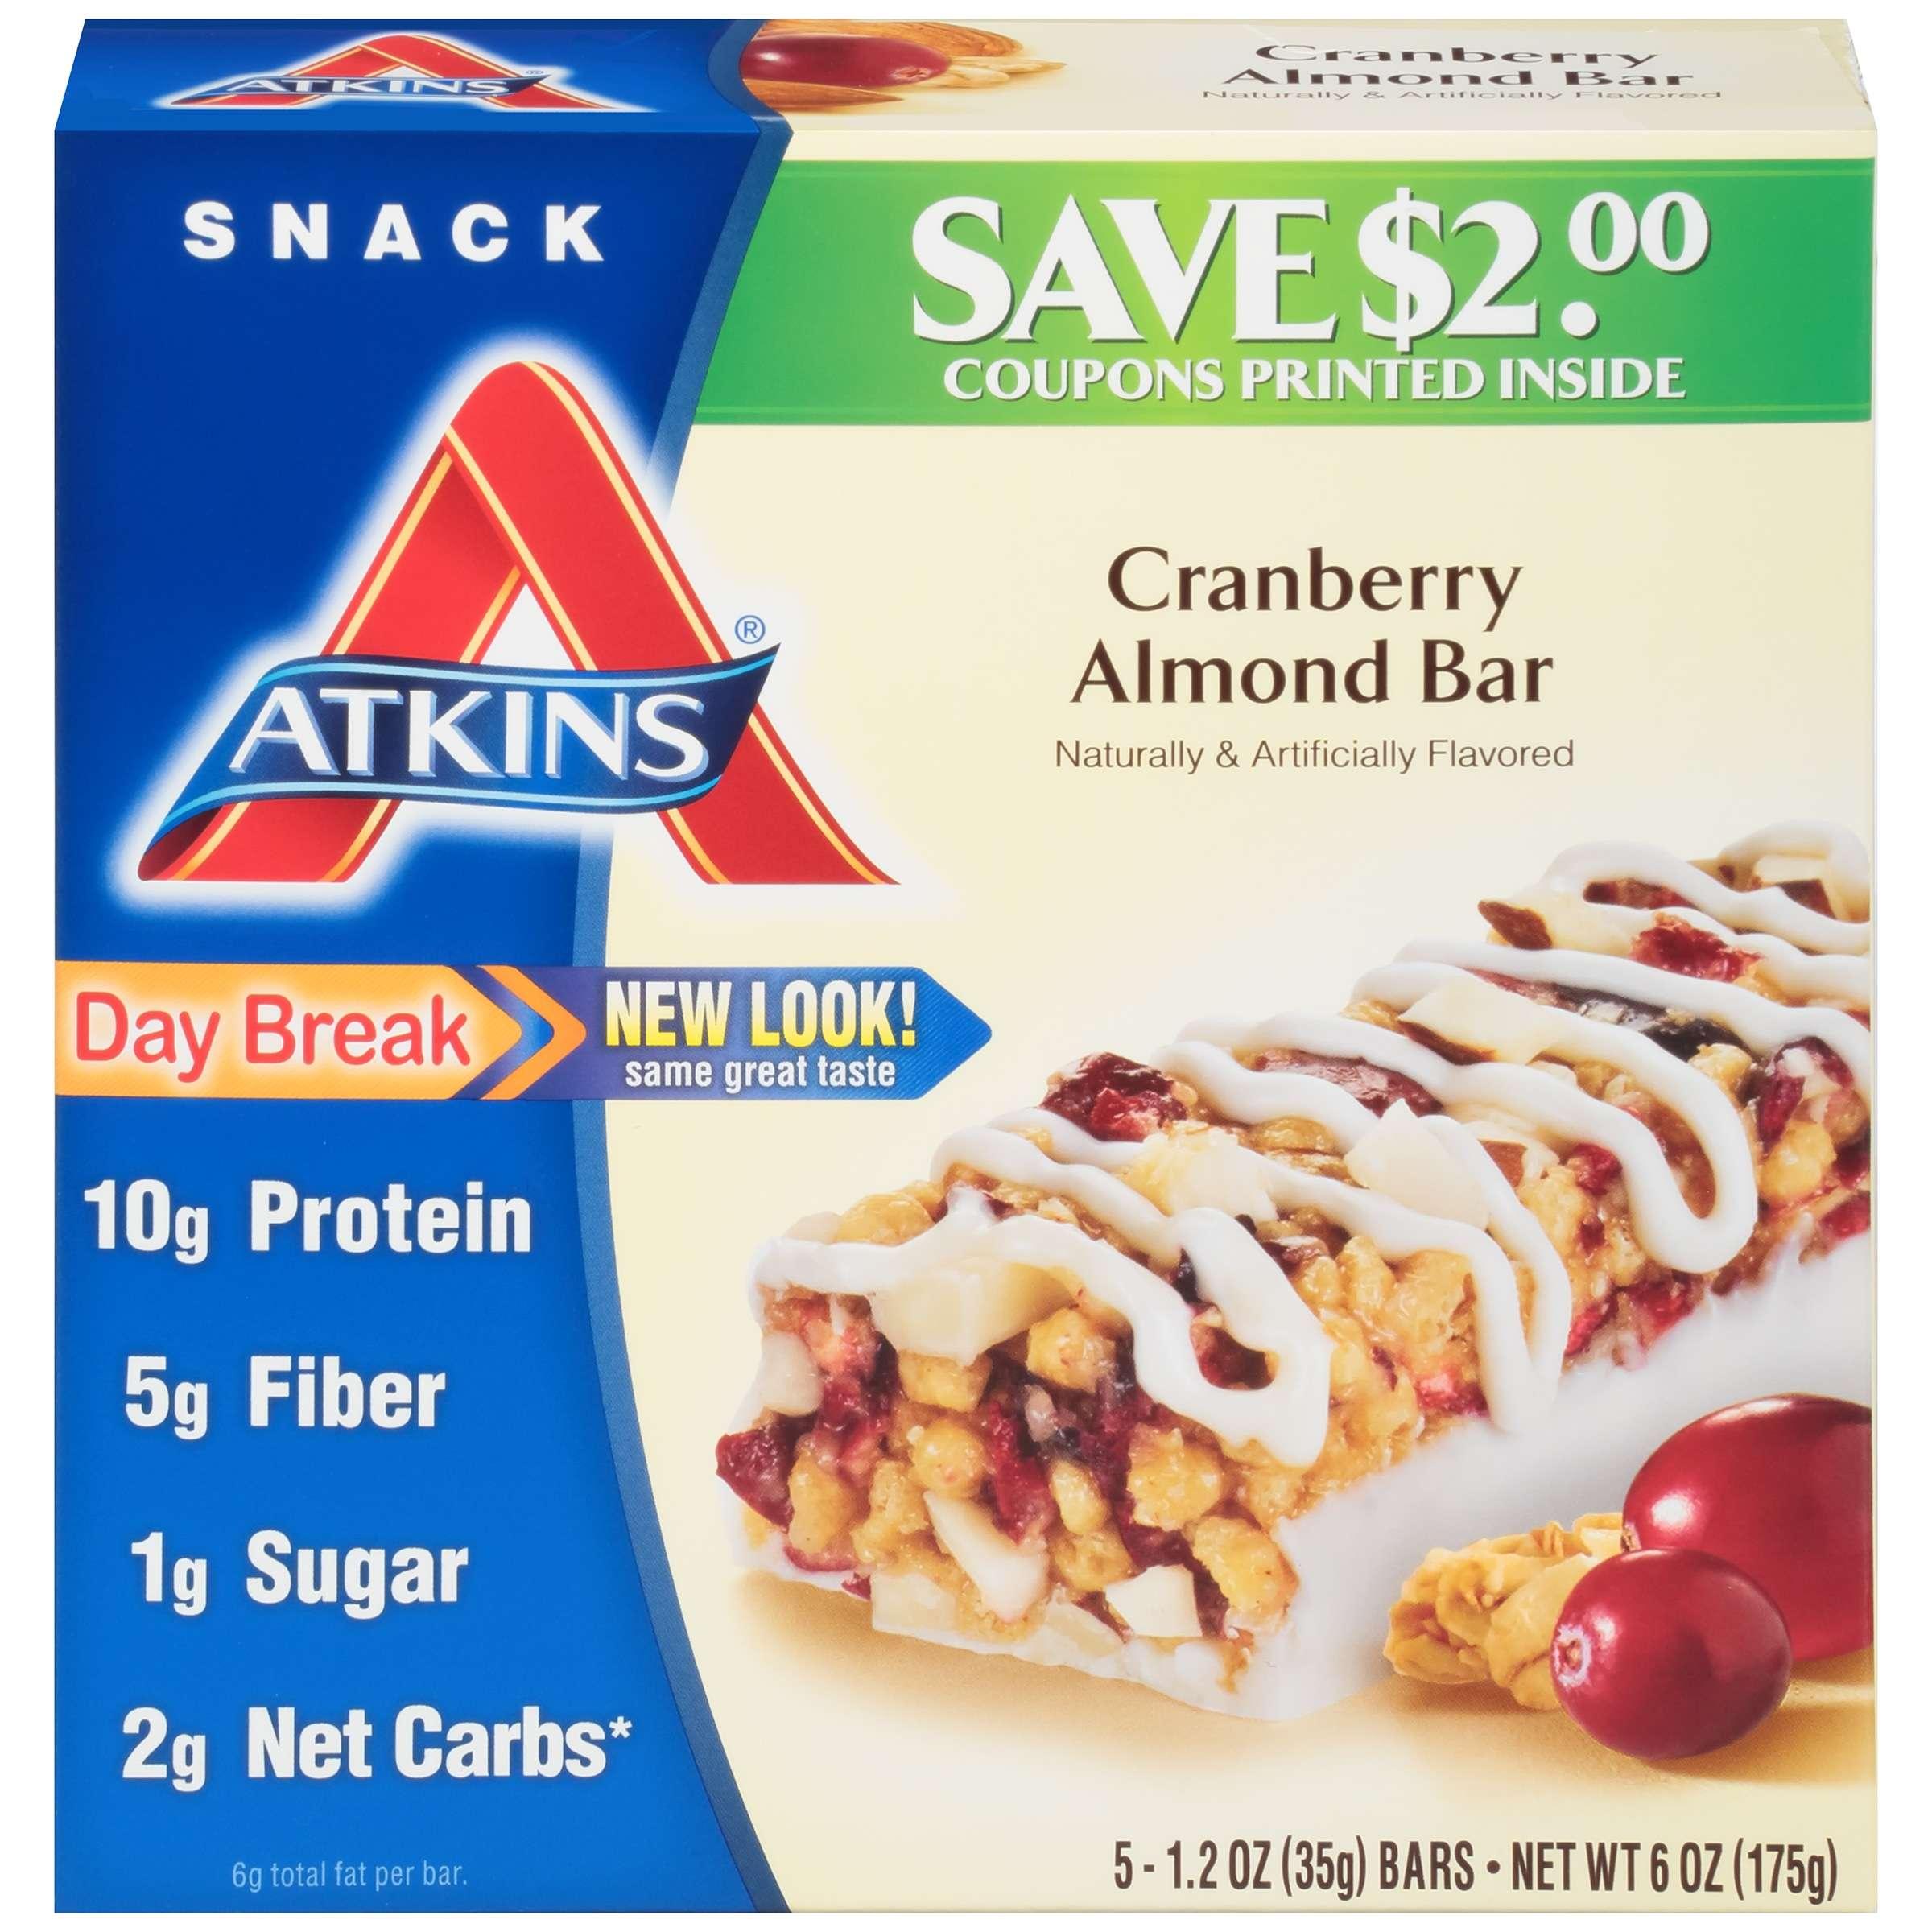 Atkins Cranberry Almond Bars, 1.2oz, 5-pack (Snack)